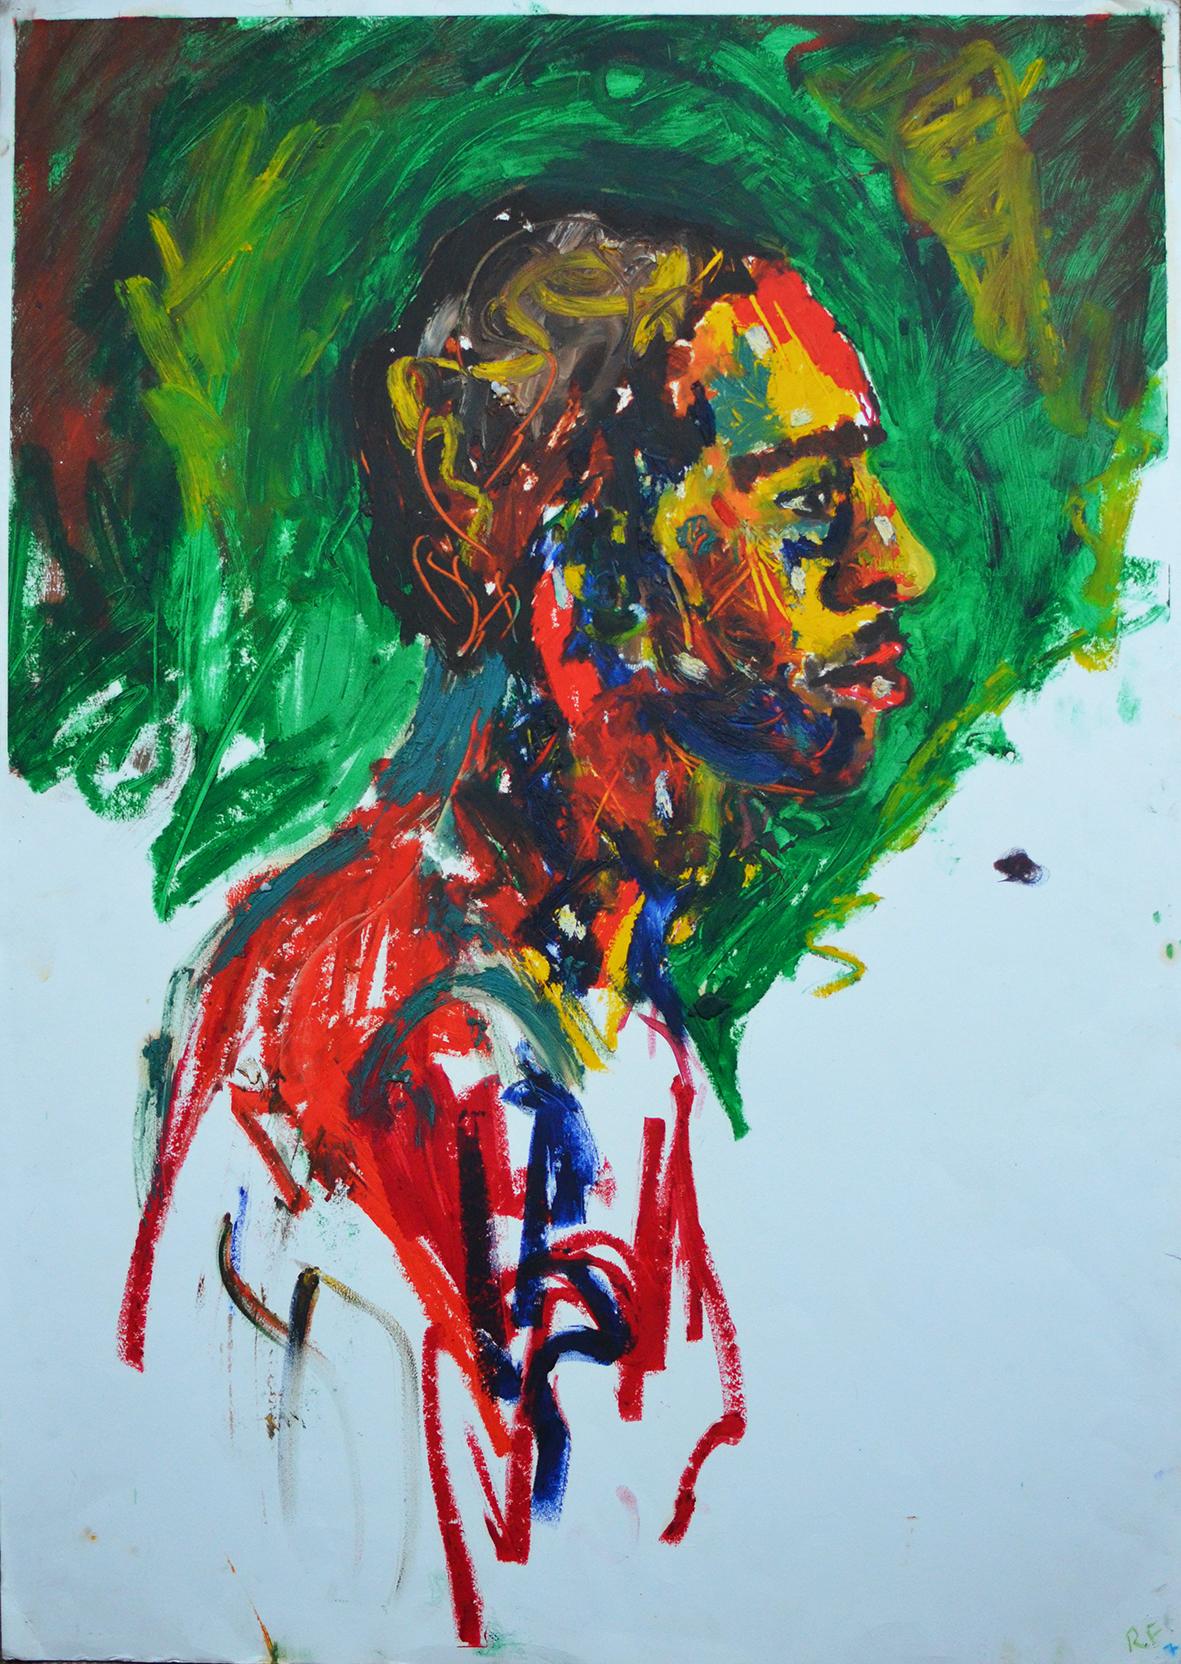 Leon, Oil Bar on Paper, Hospitalfield Summer Schools, Arbroath